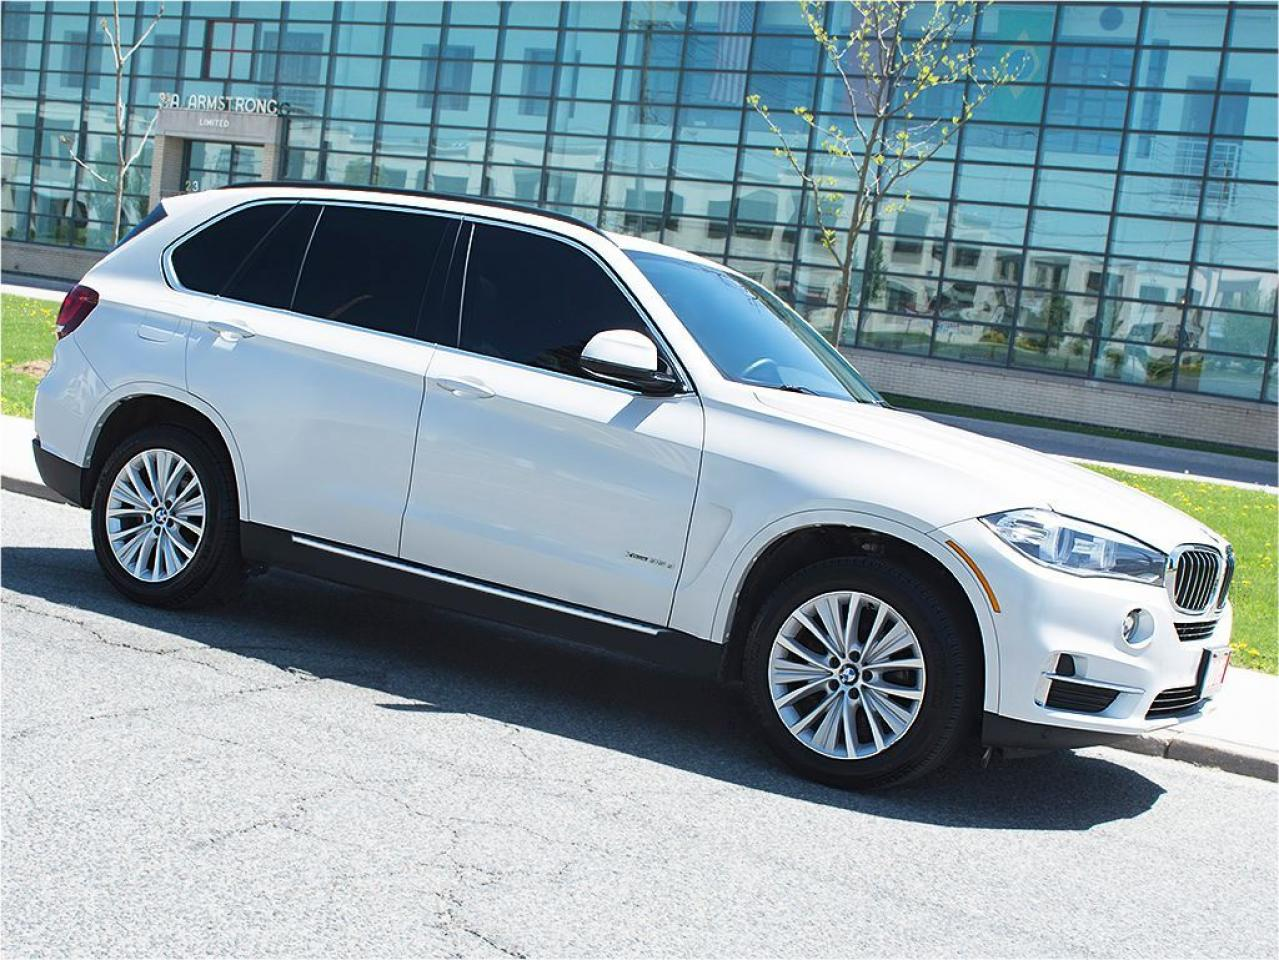 2015 BMW X5 35D|7 SEATS|NAVI|DUAL DVD|360 CAMERA|RUNNING BOARD